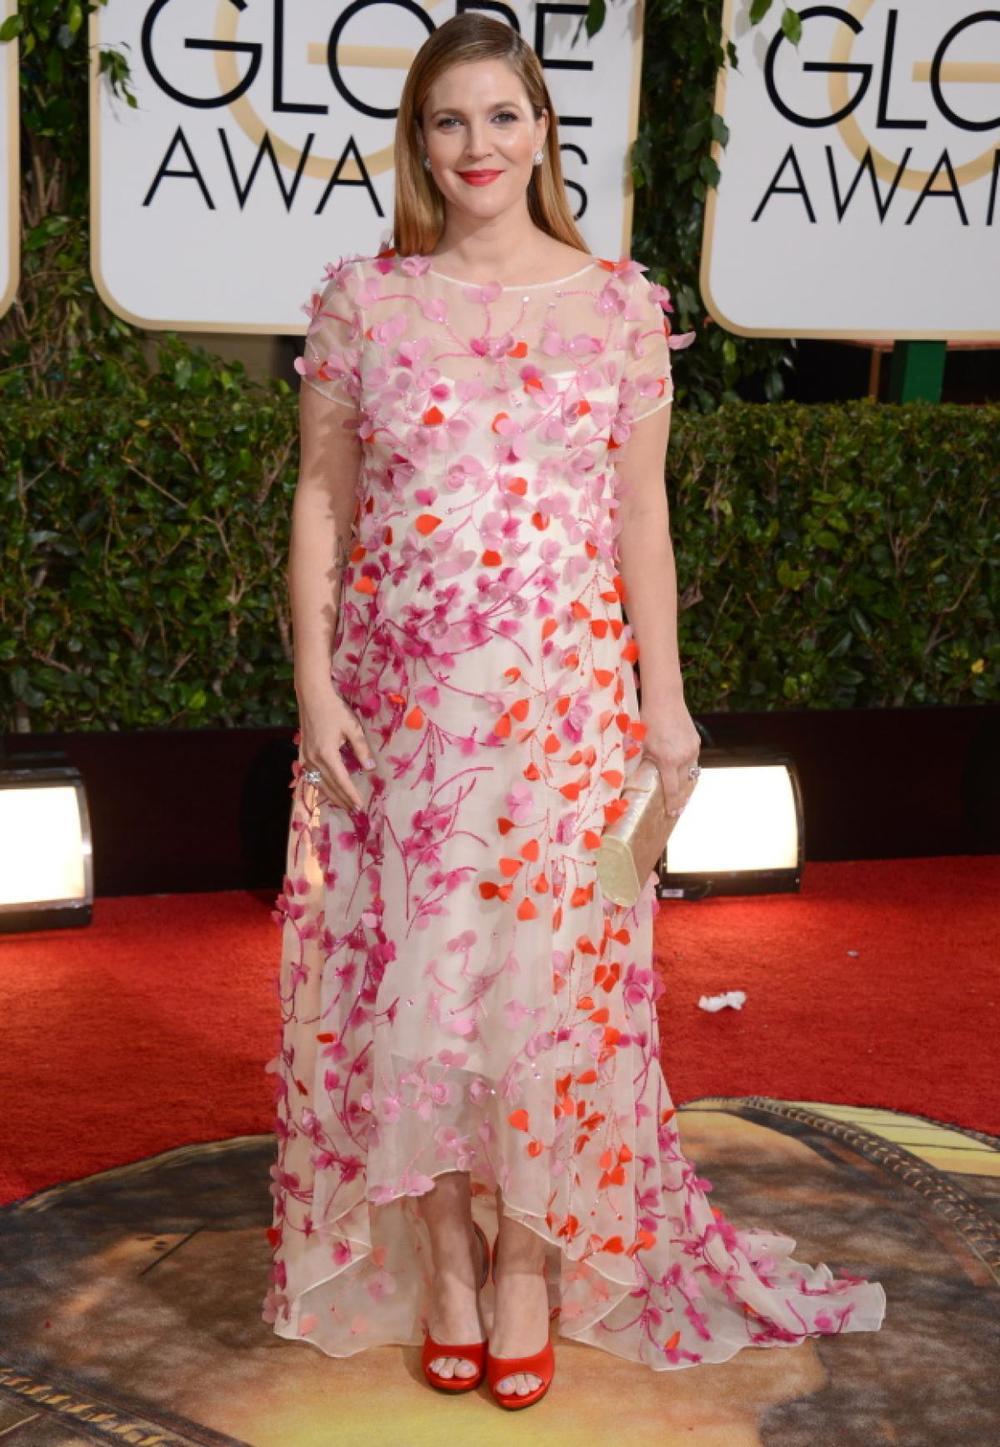 Drew Barrymore in flower-adorned Monique Lhuillier frock!